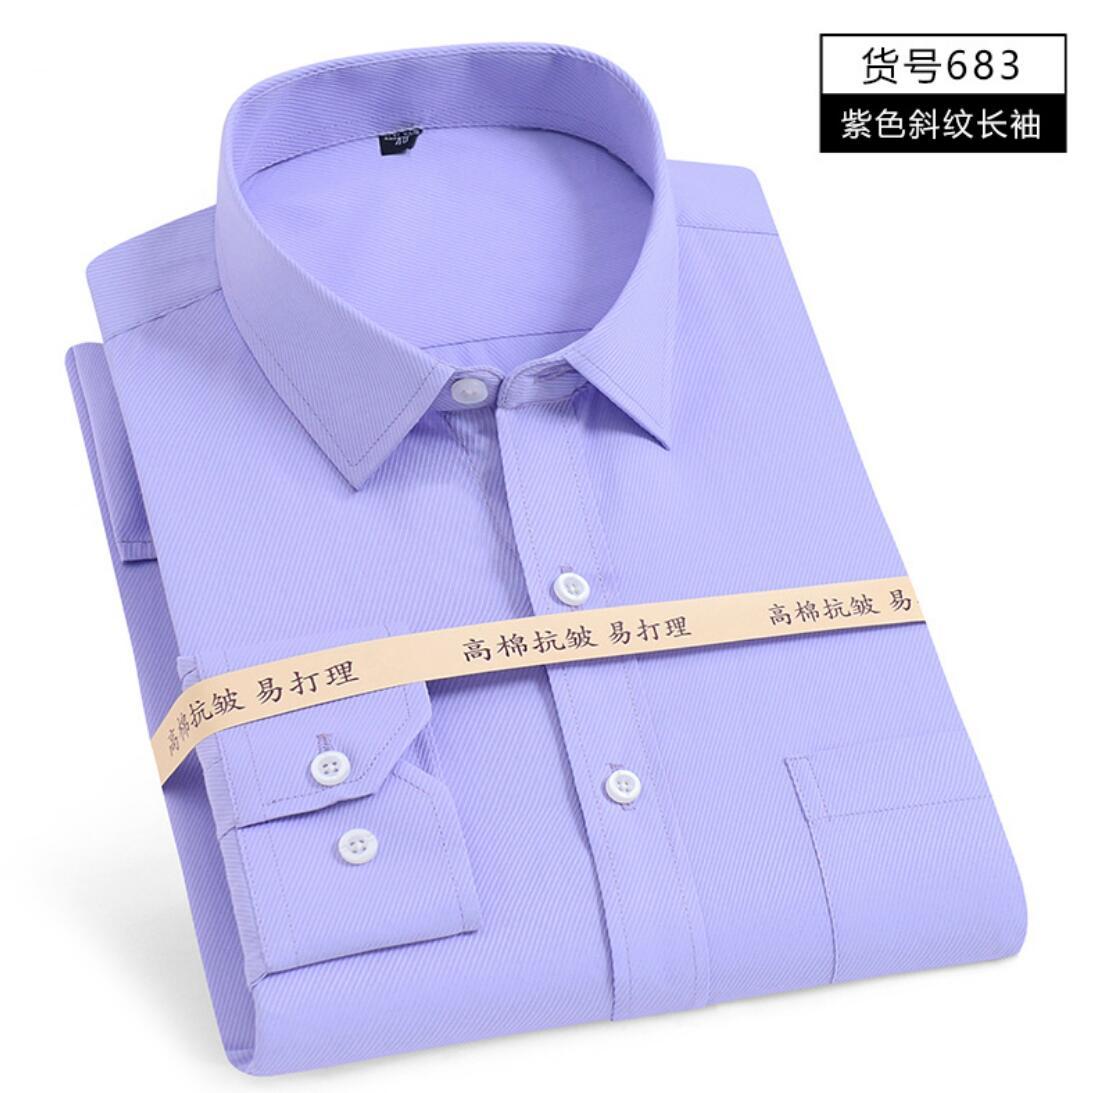 2020 NEW Men's Shirt Spring  Business Men's Solid Color Short J77 Sleeve White Shirt KW9209-1